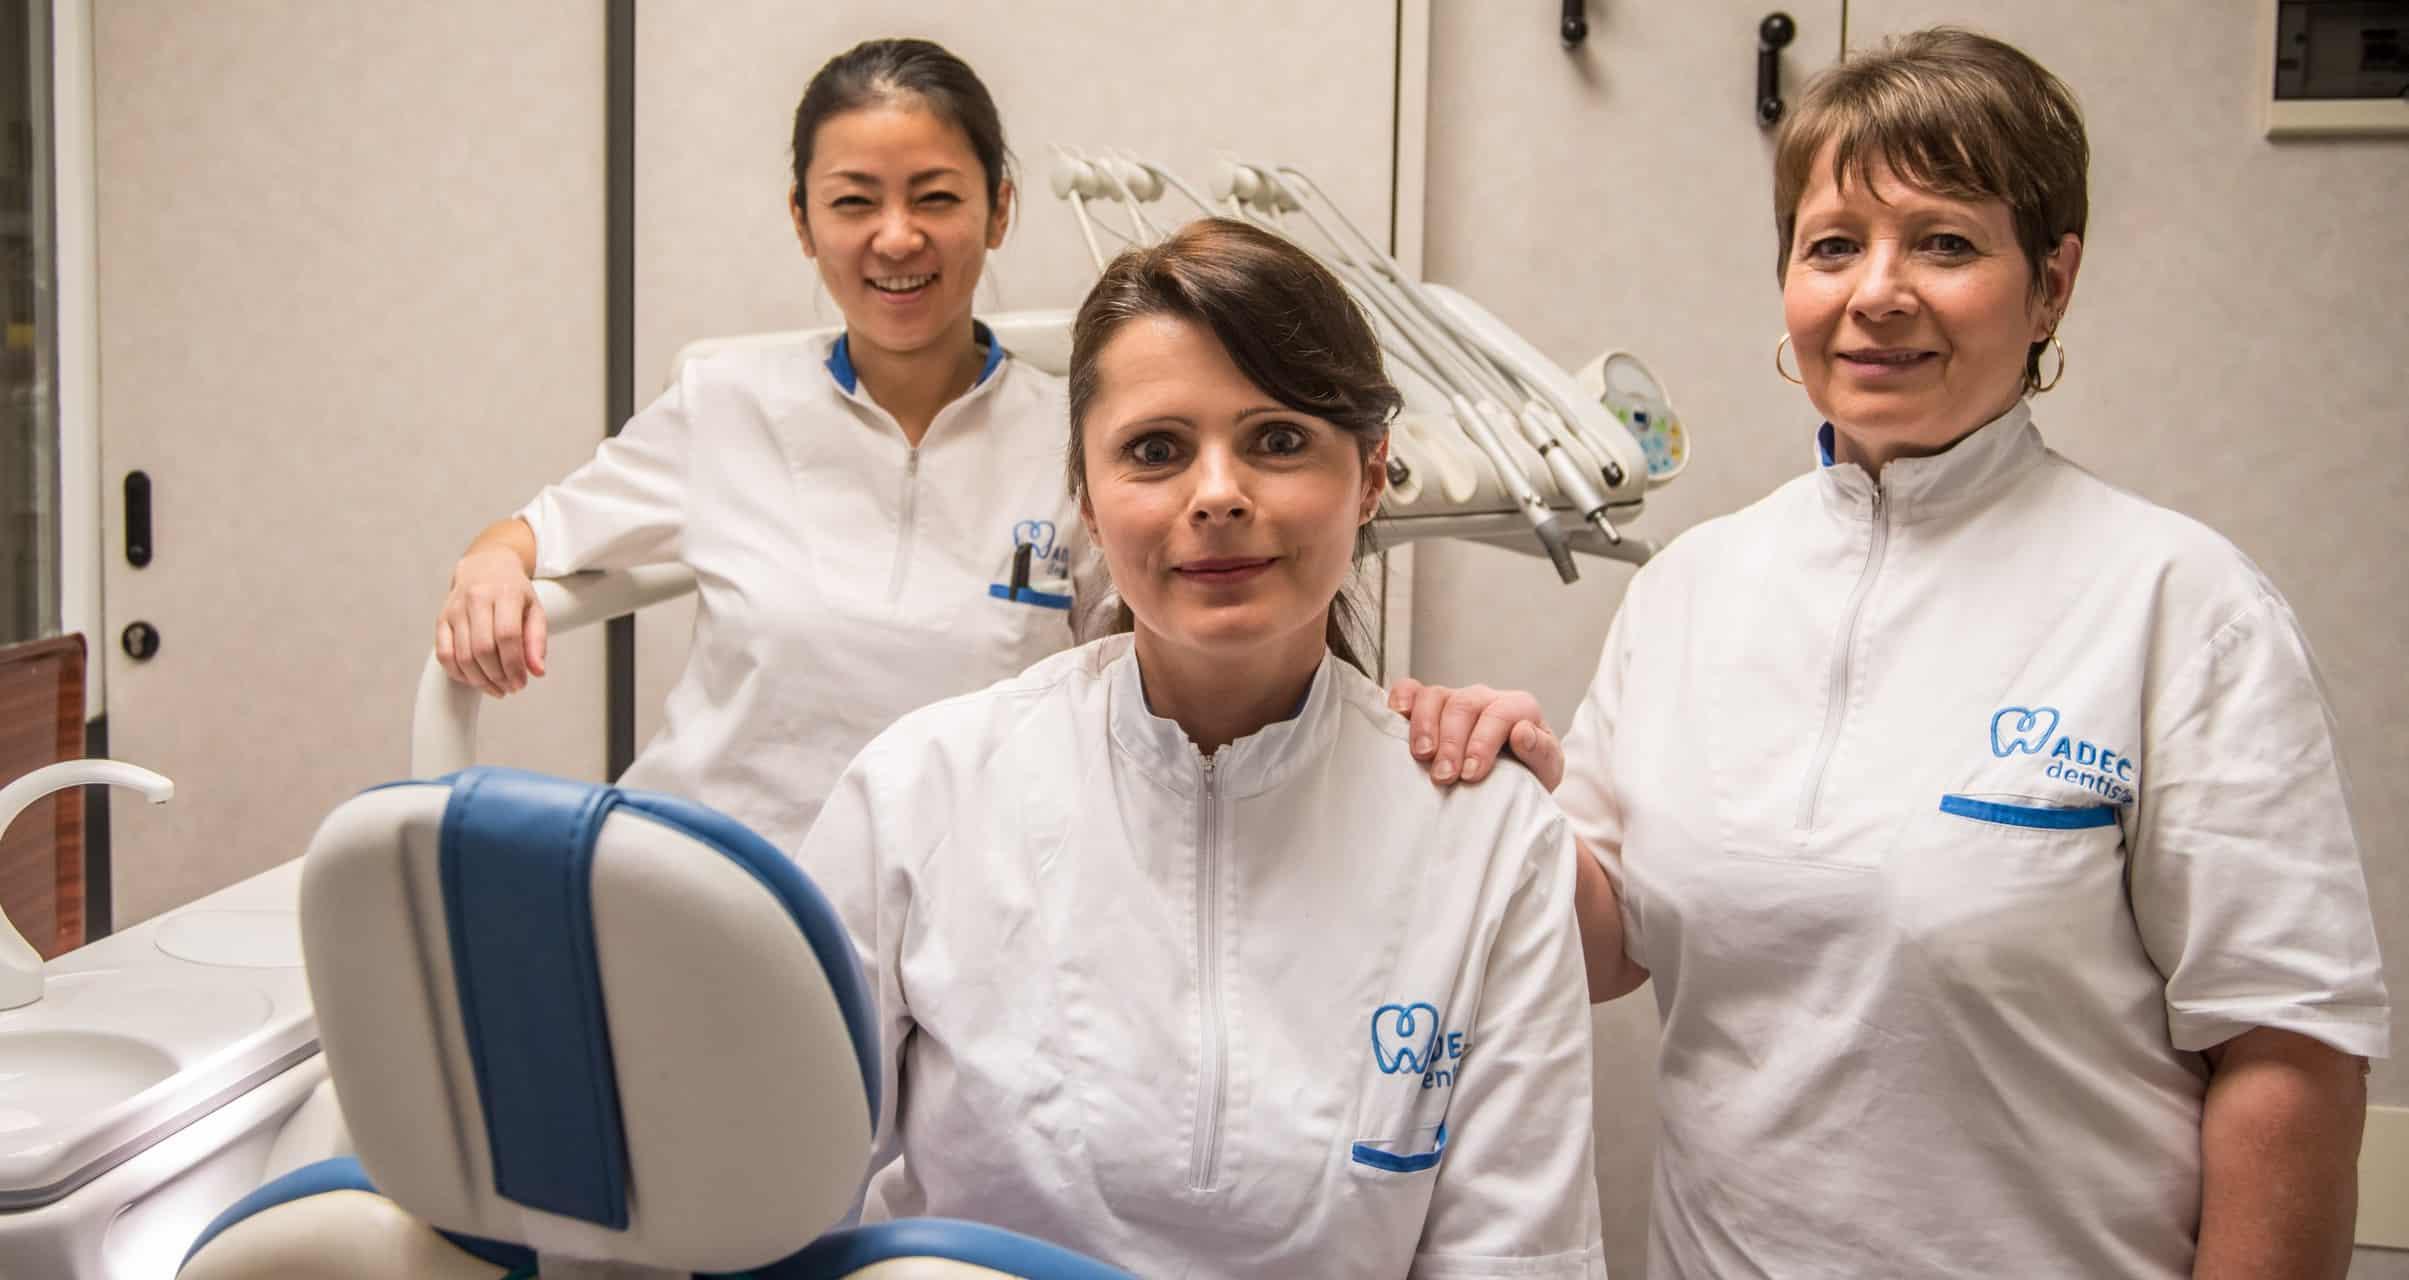 Da sinistra a destra: Sachiko dal Giappone, Olesya e Zina dall'Ucraina